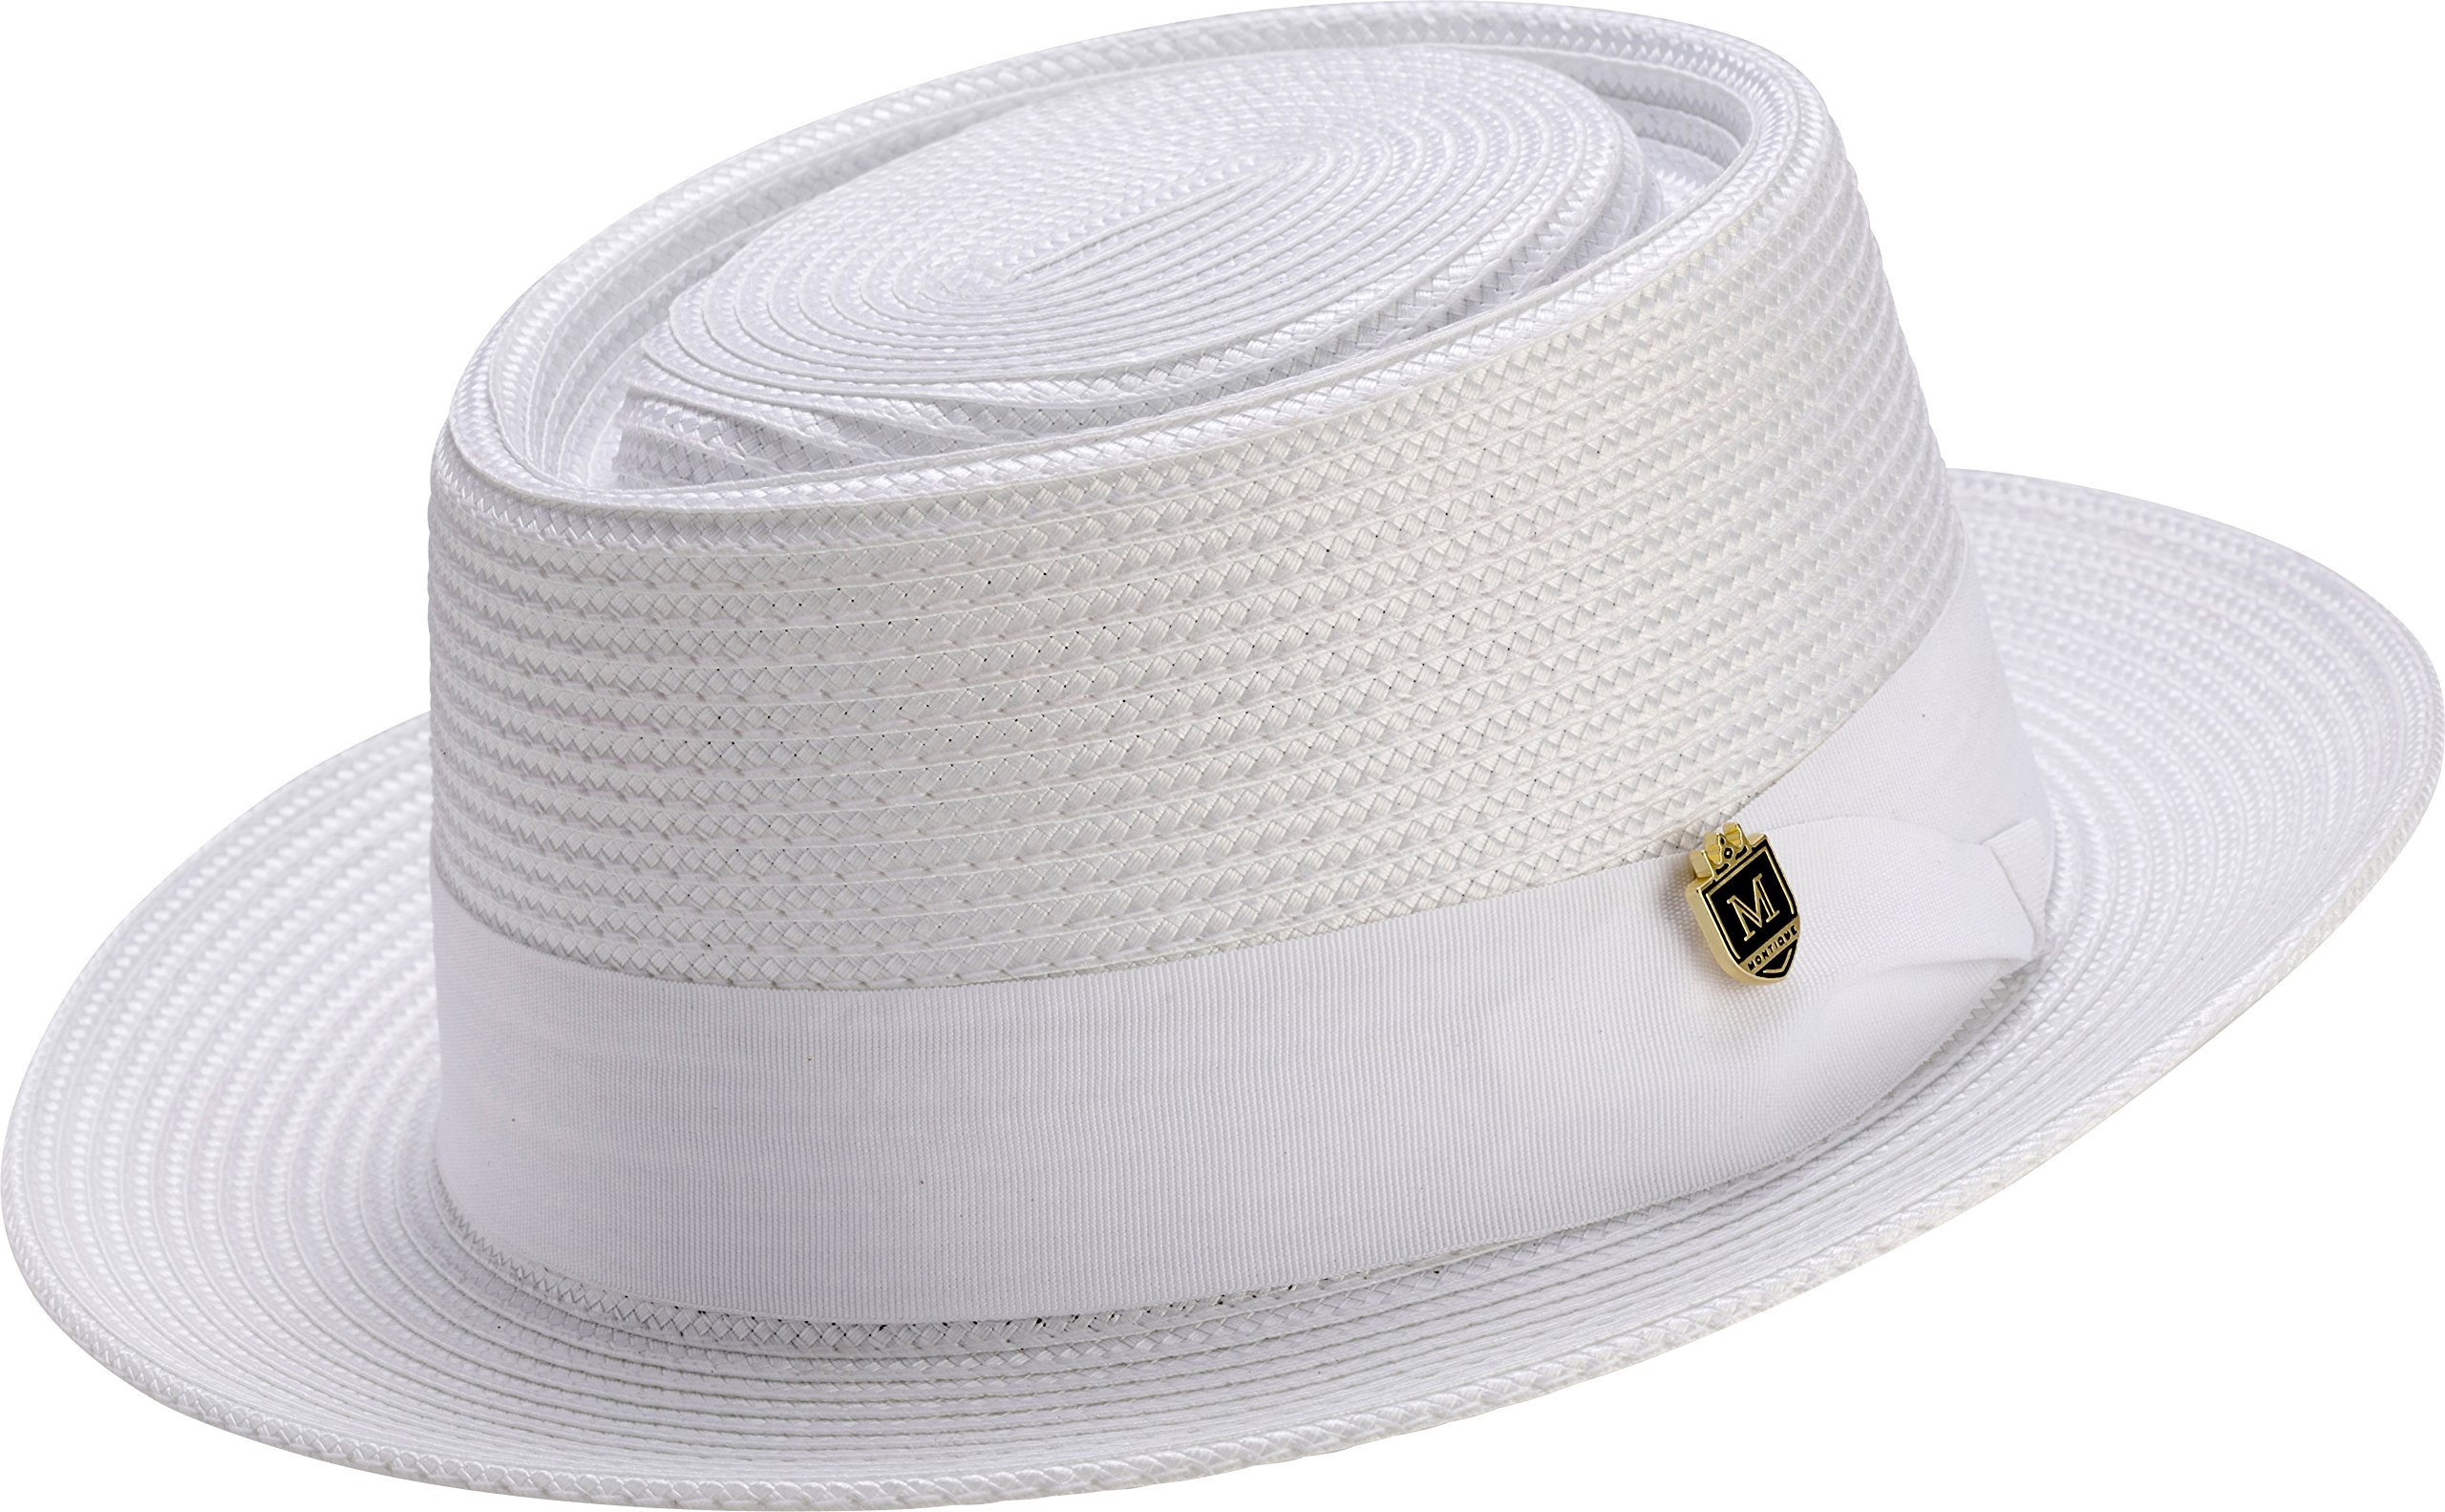 421d1a7b92a10 MONTIQUE Men s Teardrop Dent Stiff Hard Weaved Pork Pie Hat H50 (Large